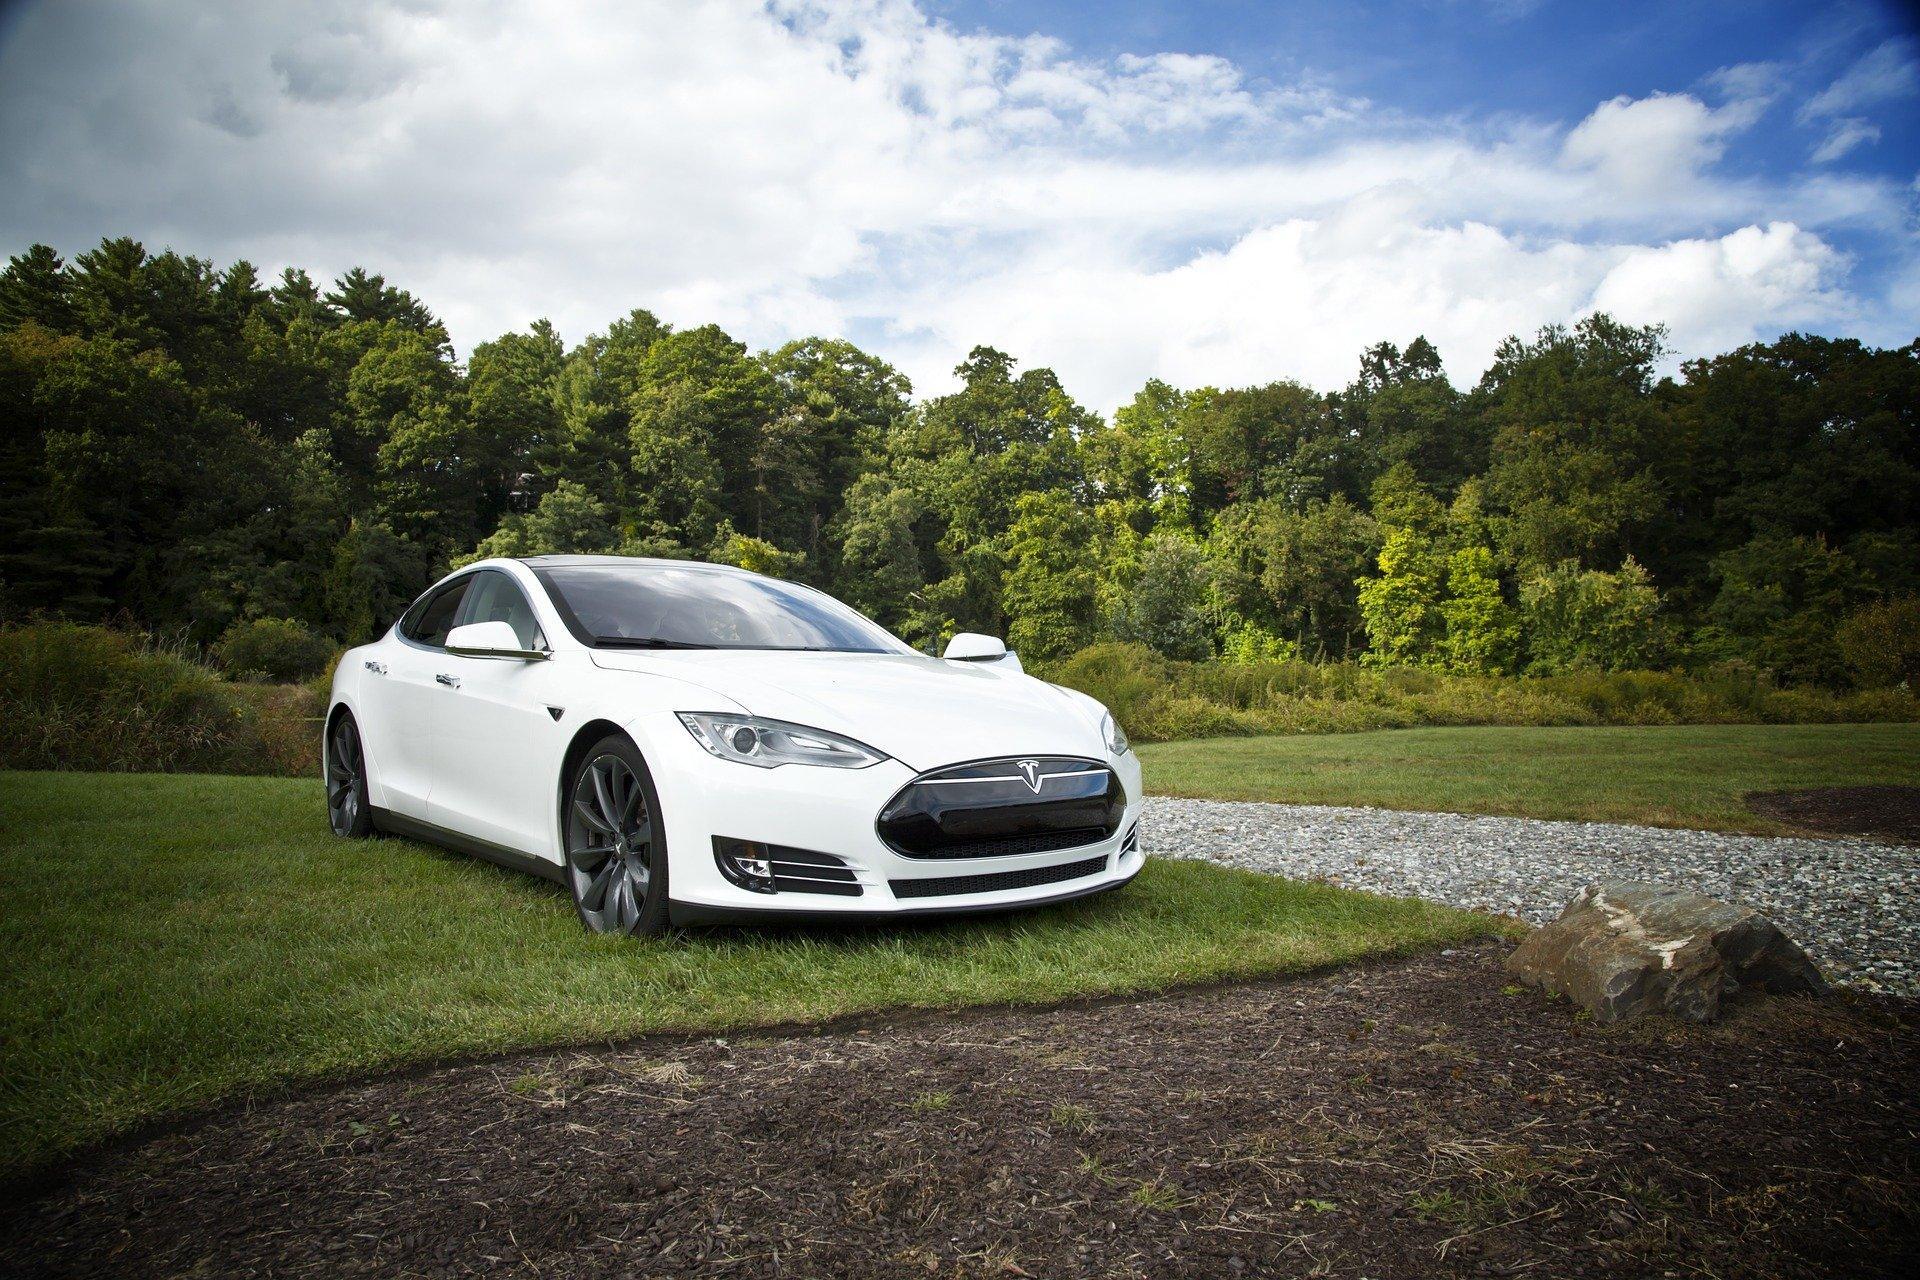 Auto elettriche, Tesla